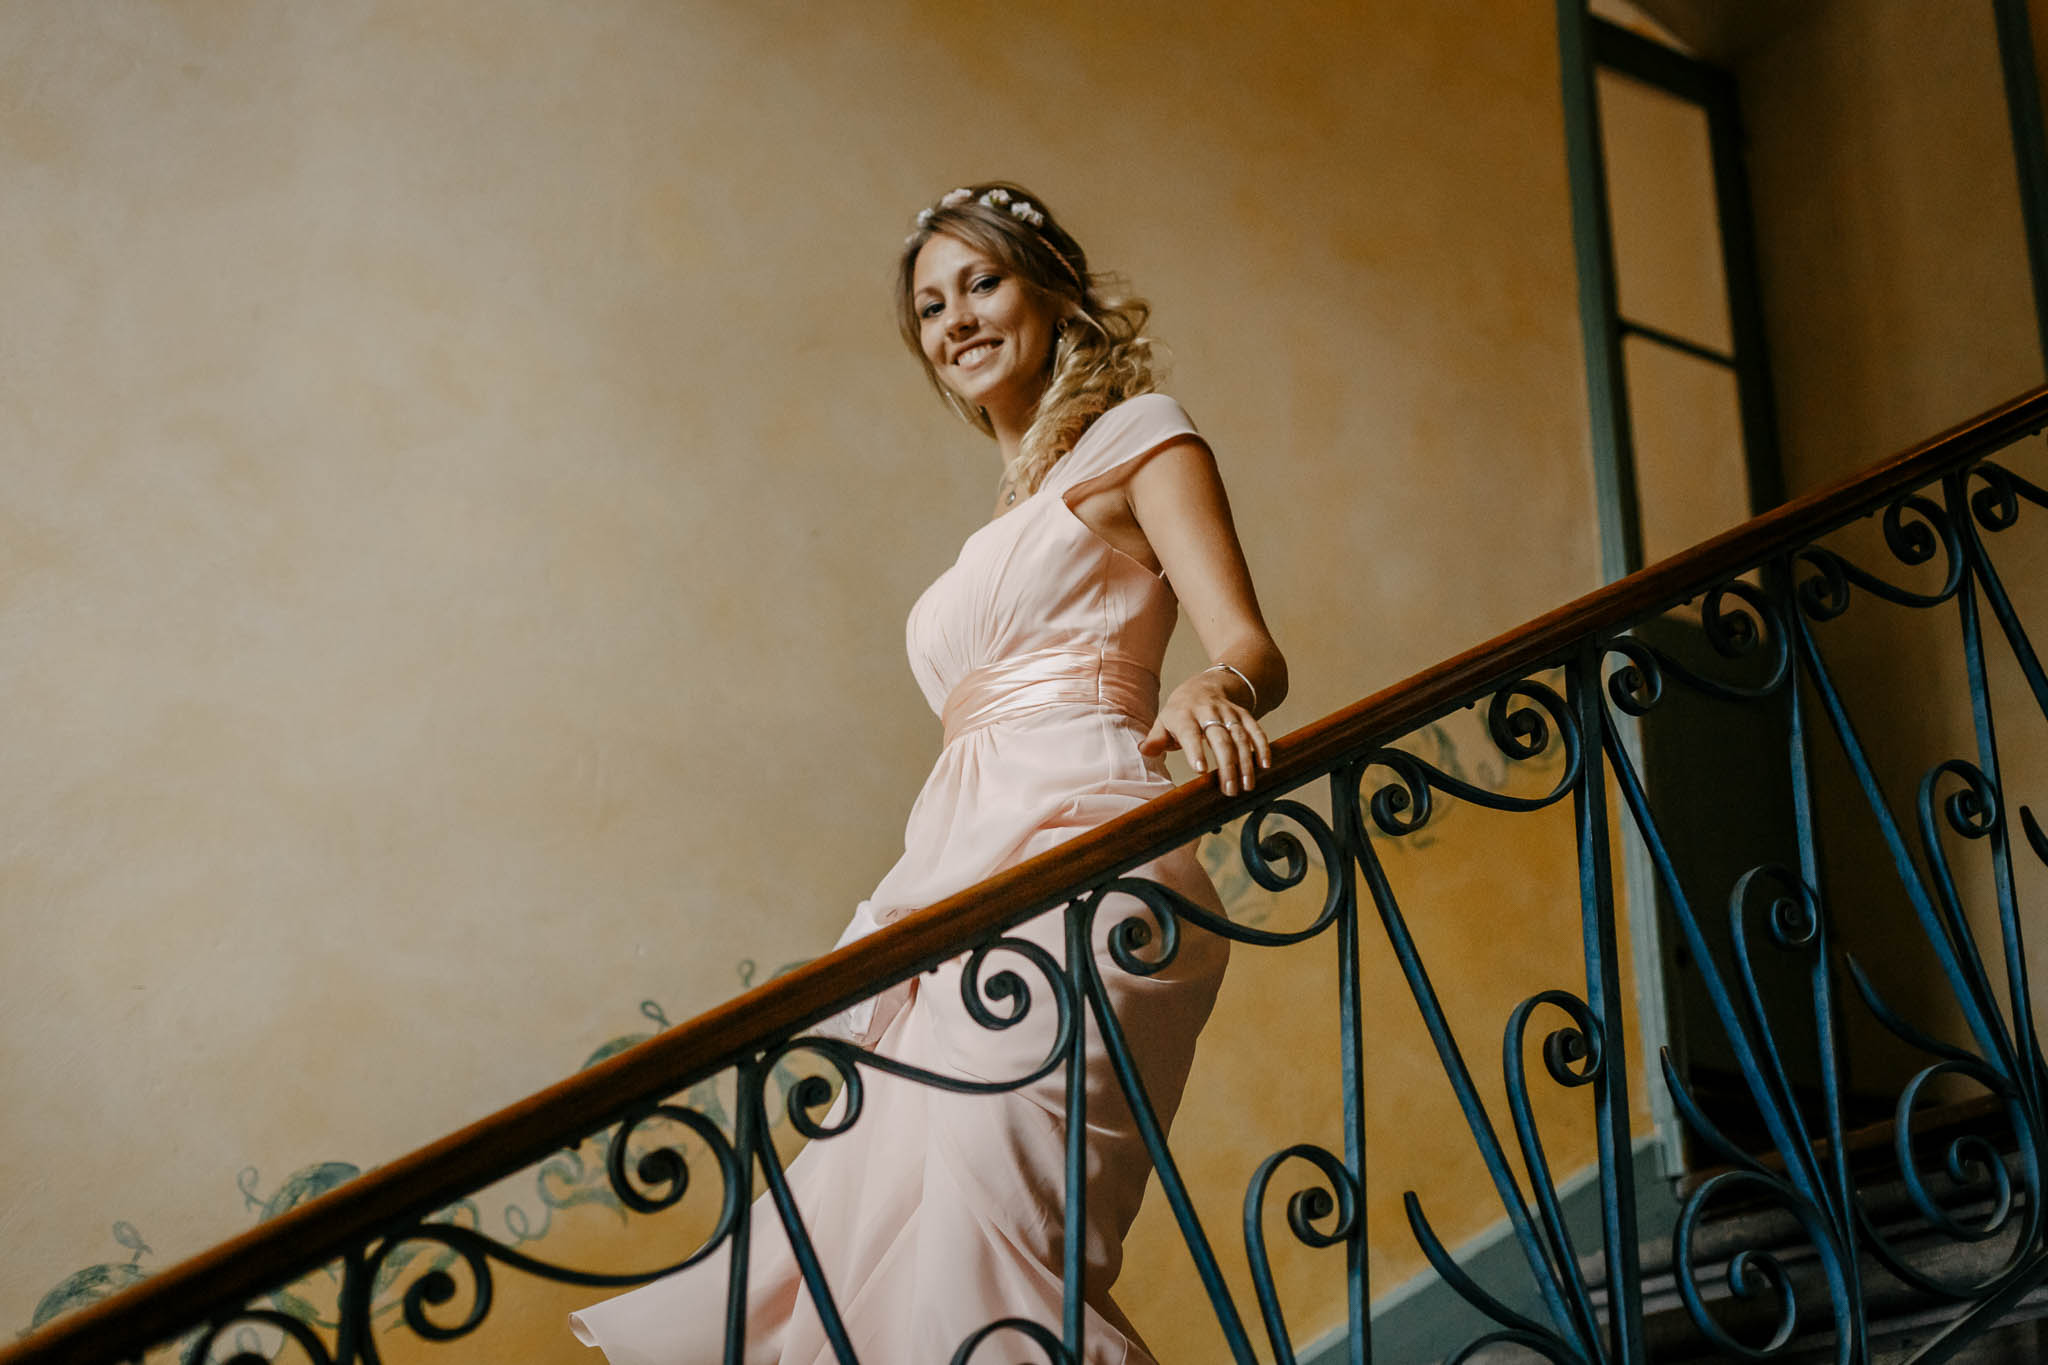 mariage-chateau-gaudras-ingold-22.jpg